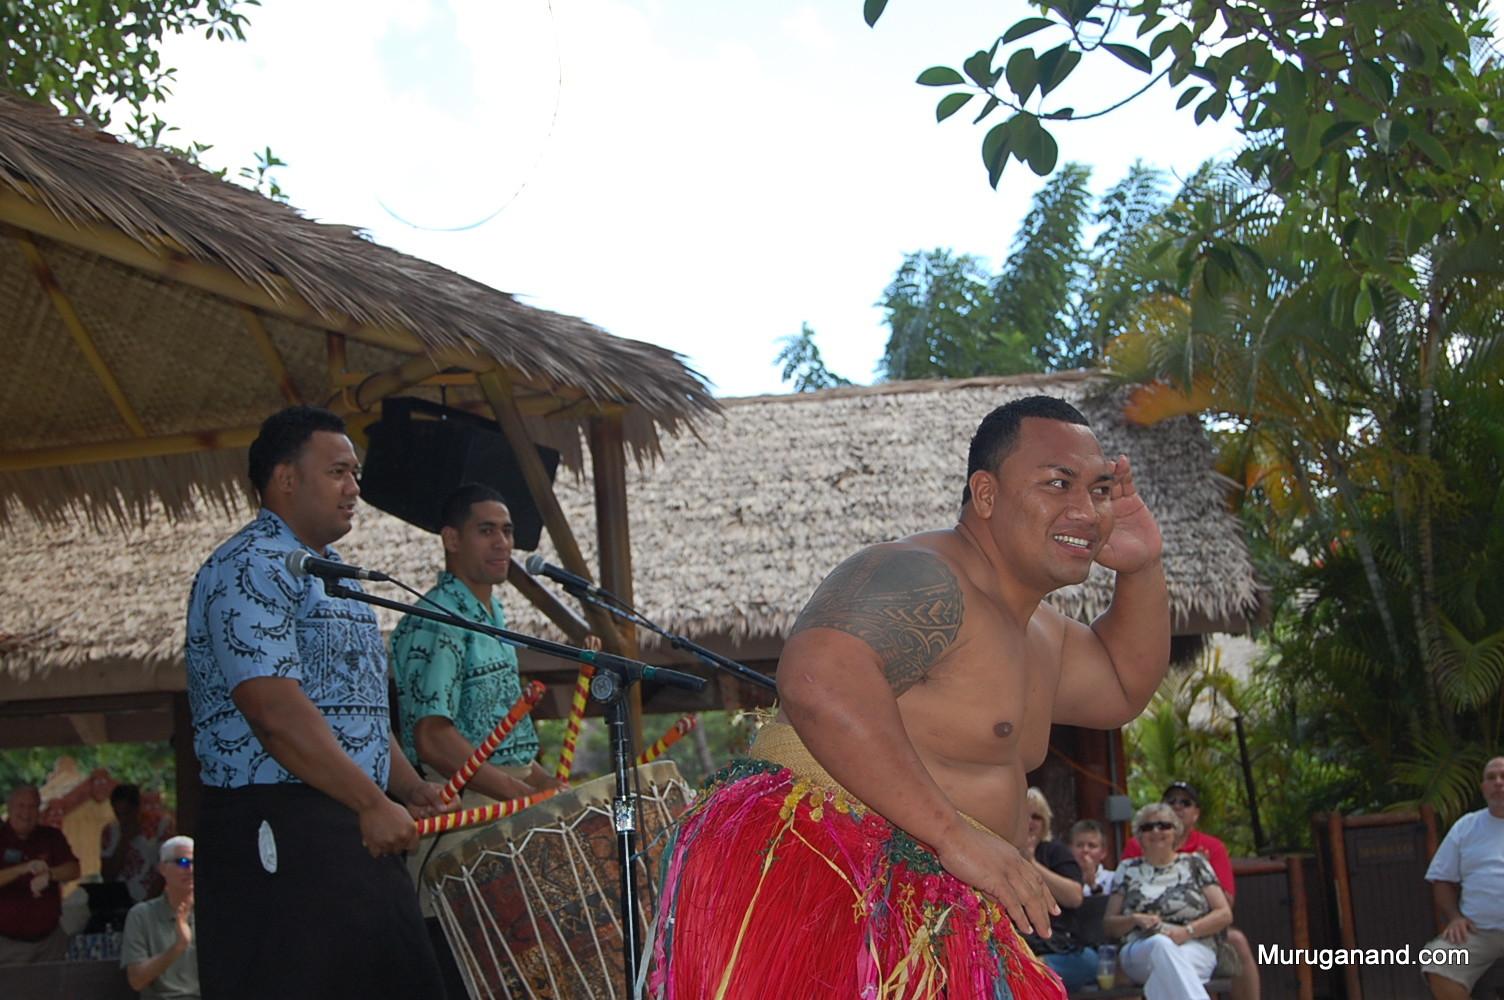 Tongan Performance (O'ahu)